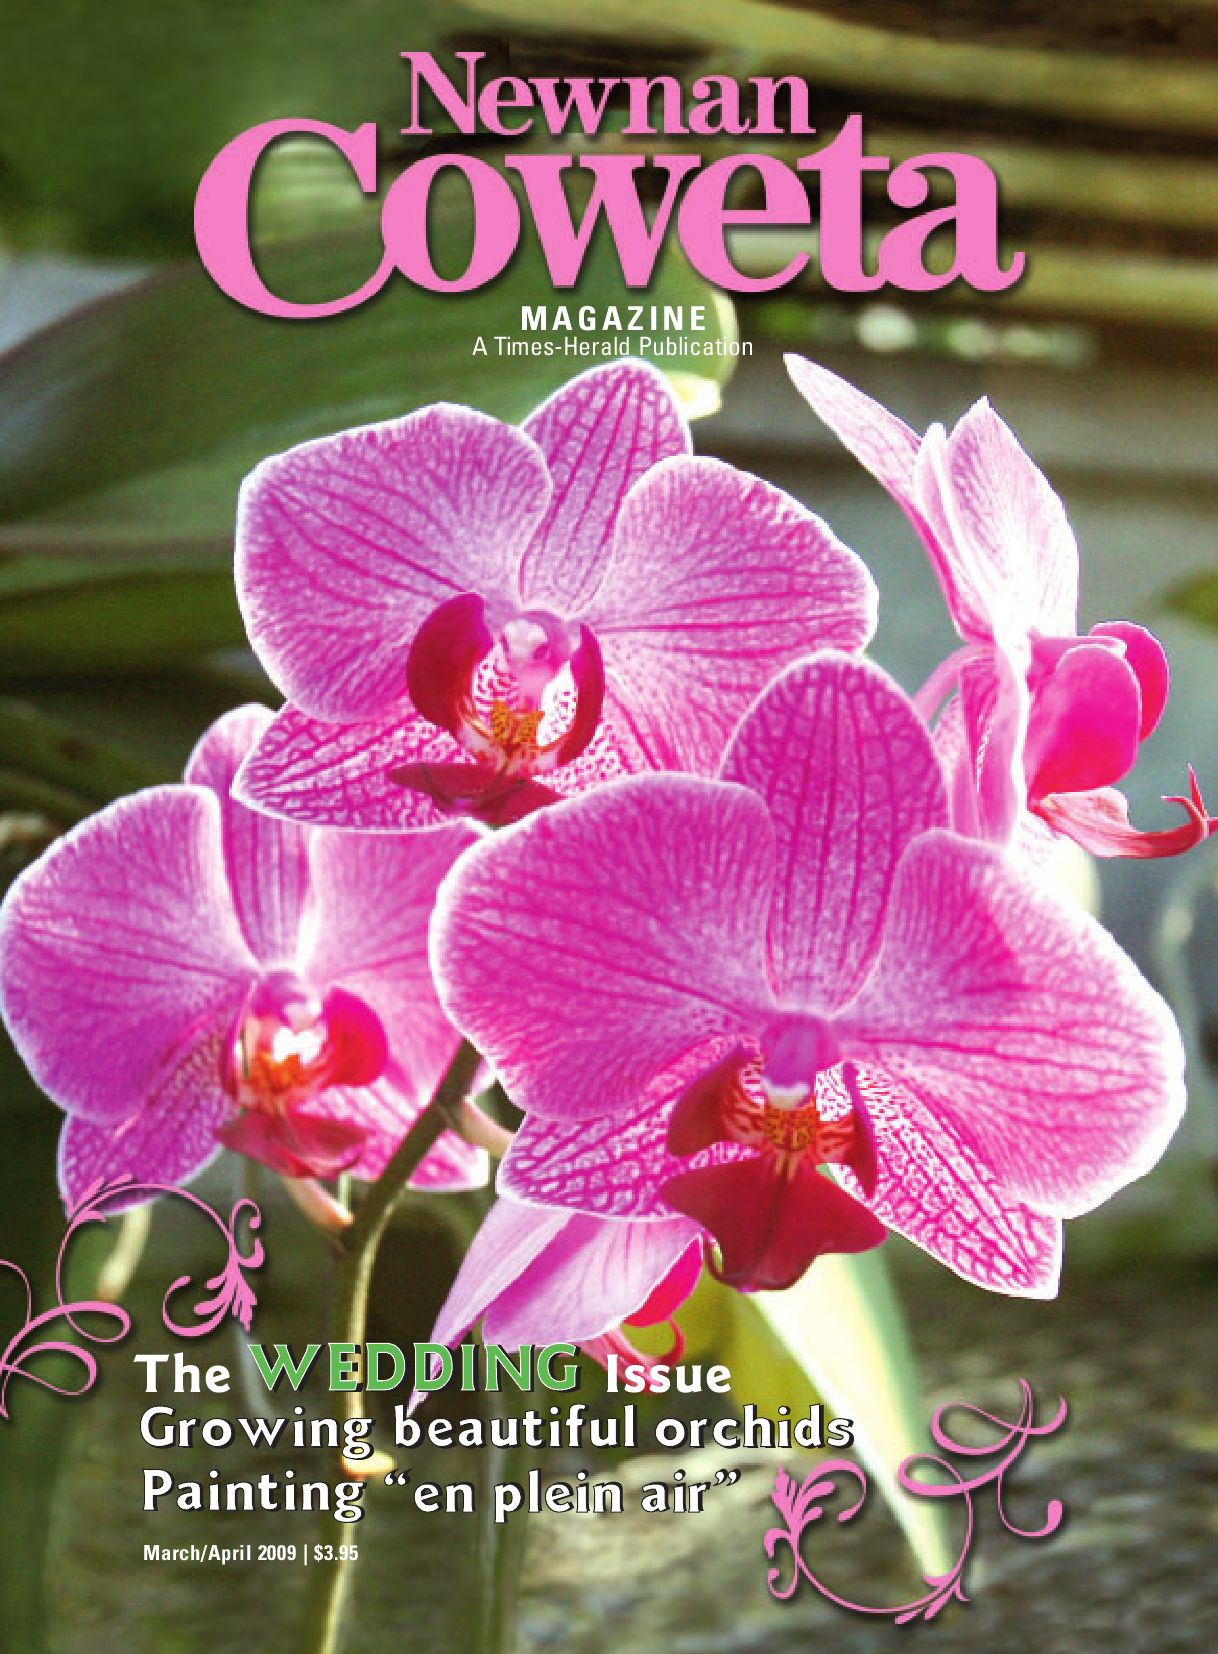 Newnan-Coweta Magazine March/April 2009 by Deberah Williams - issuu